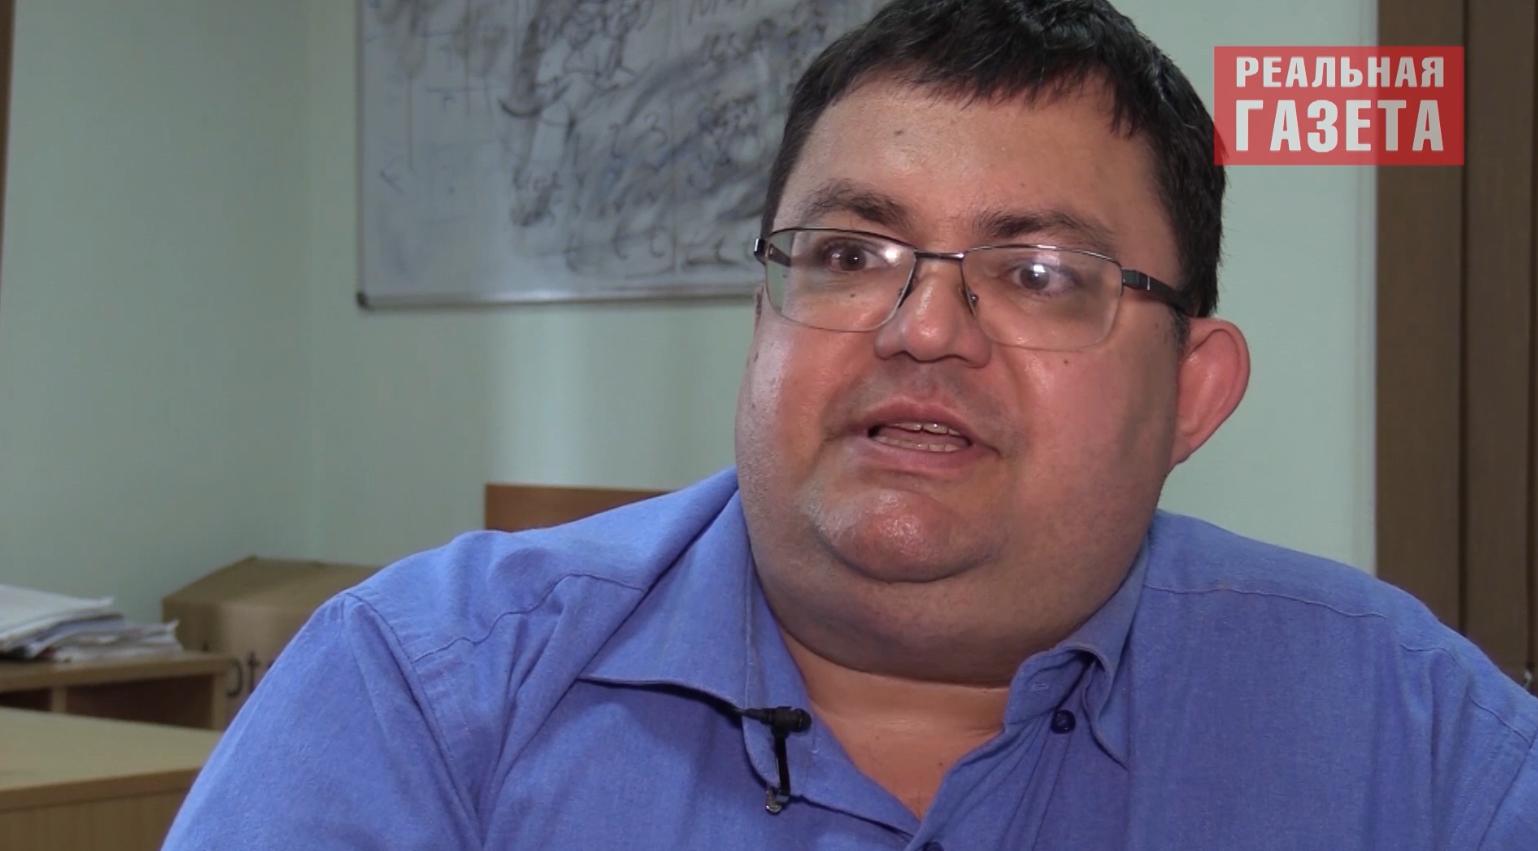 «Лекарство» вне закона. Станет ли каннабис панацеей от «Донбасского синдрома»?